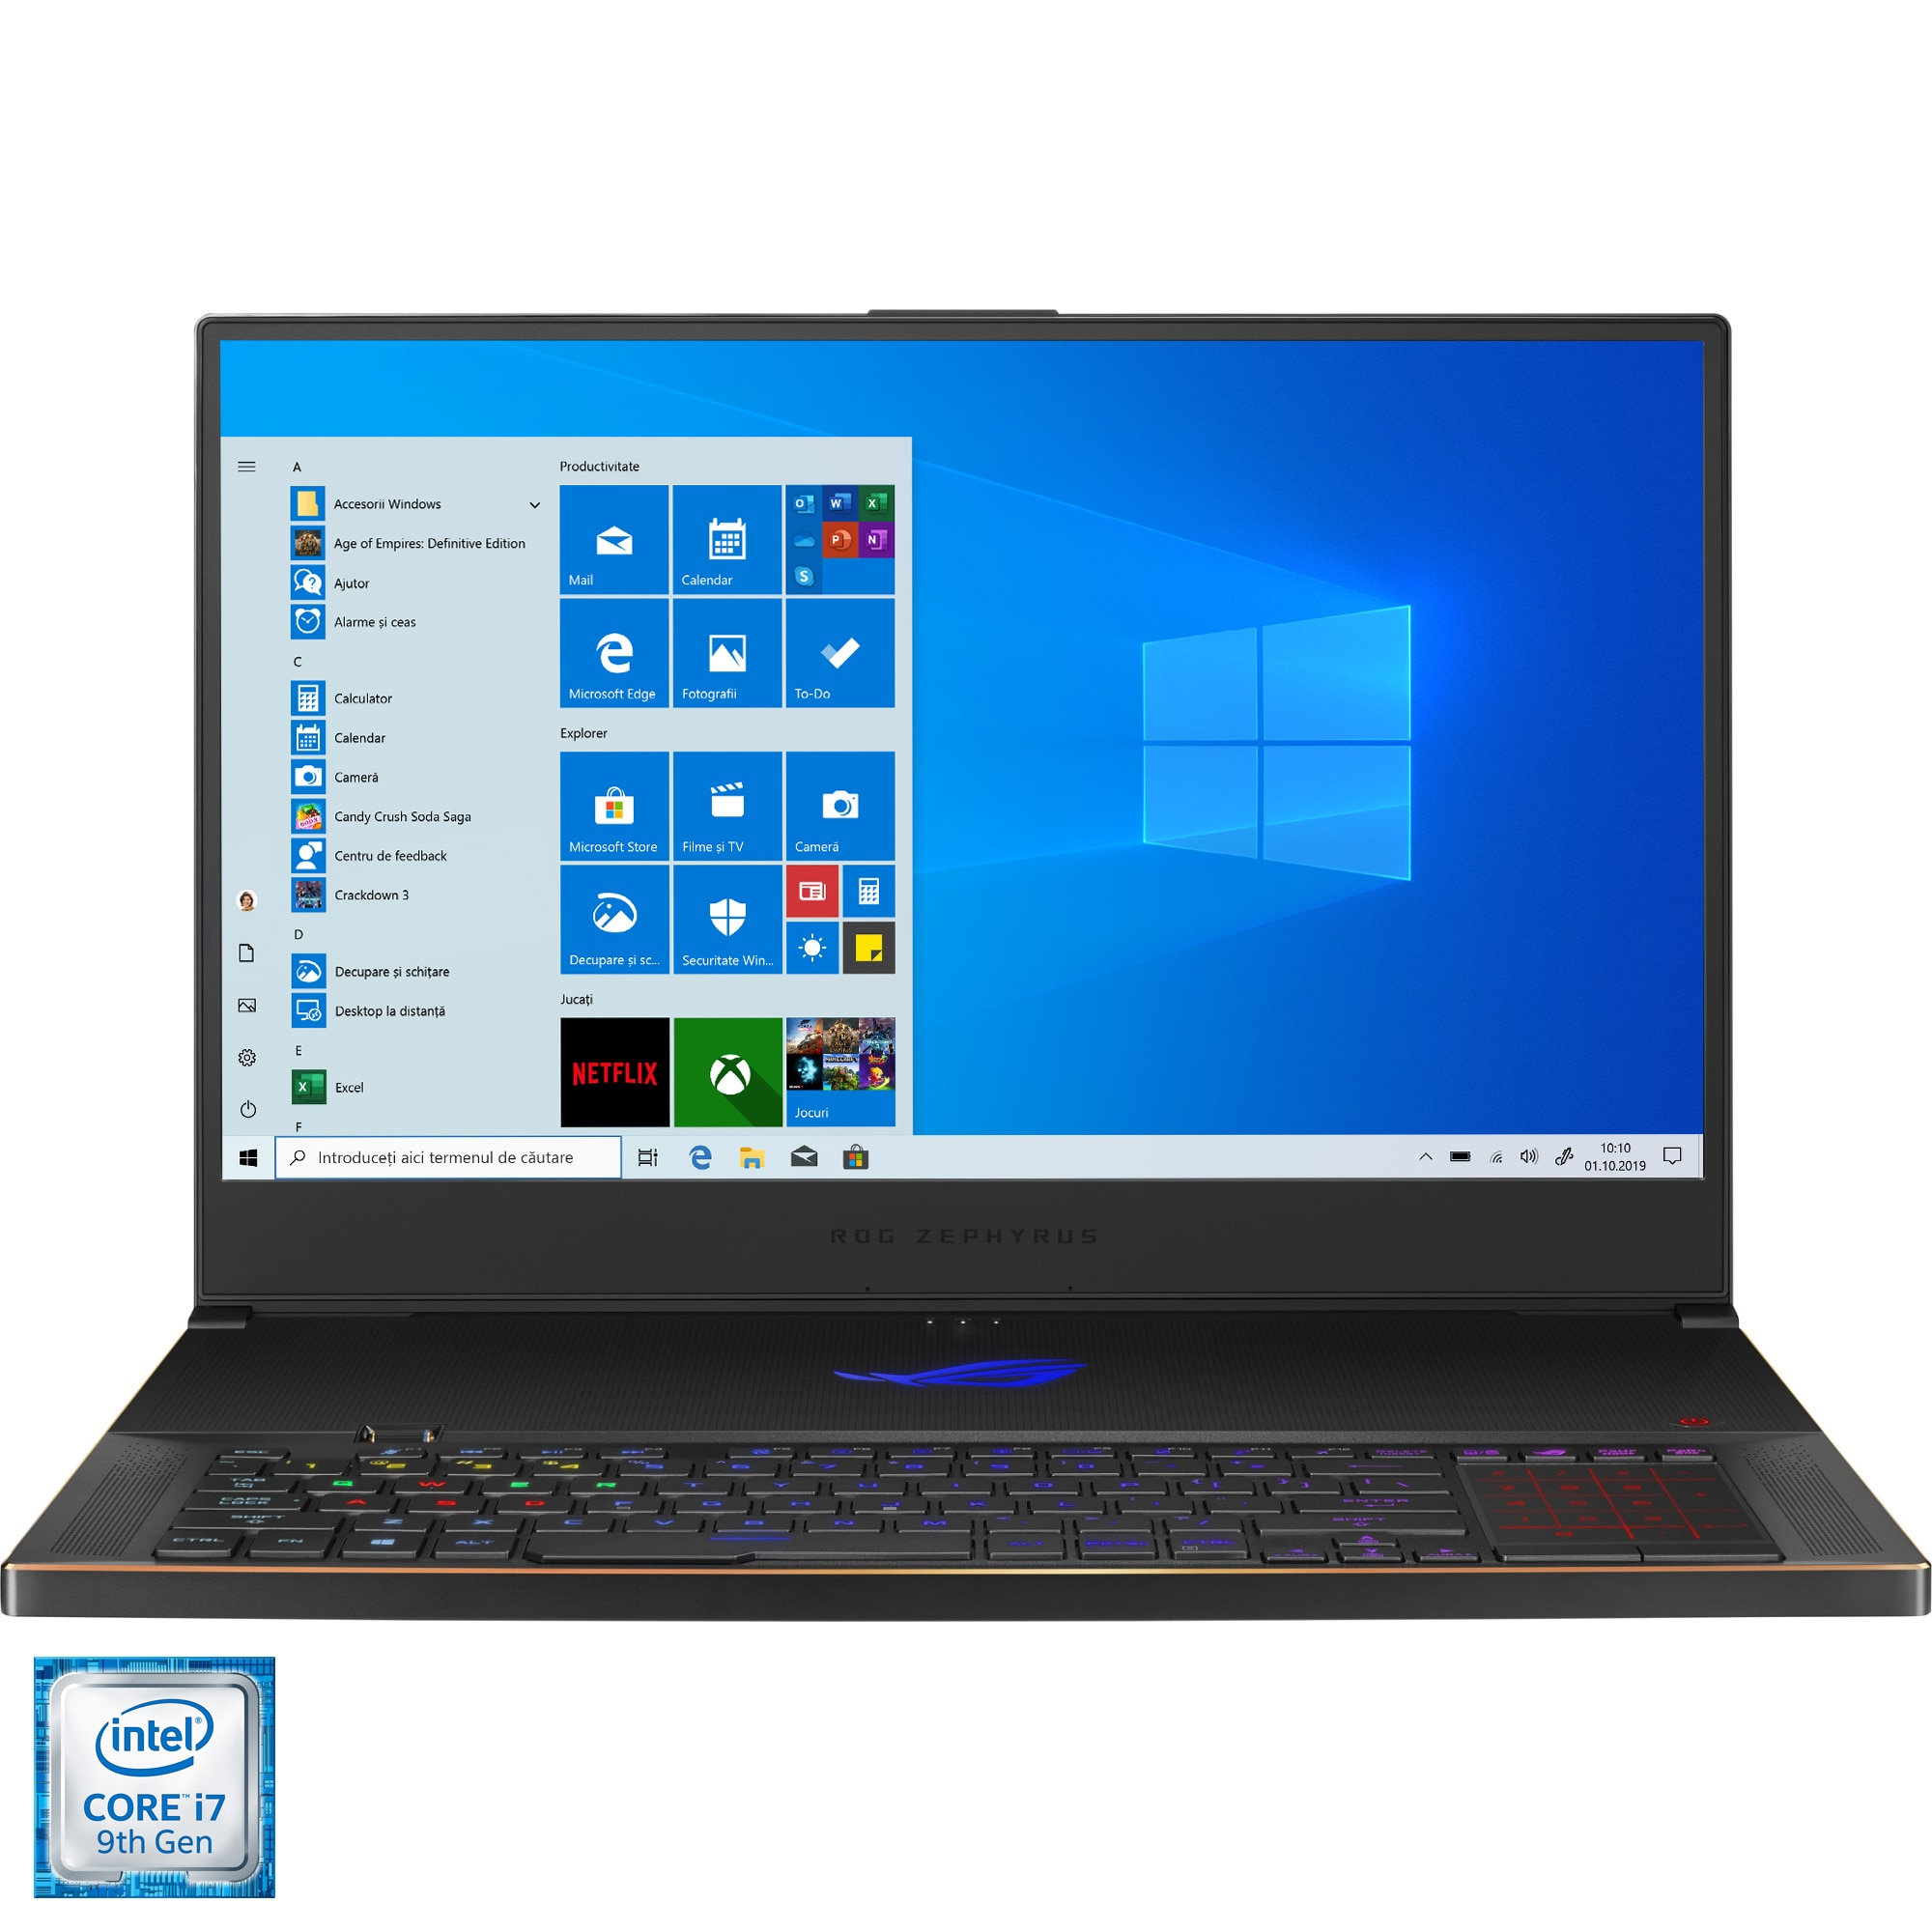 "Fotografie Laptop Gaming ASUS ROG Zephyrus S GX701GWR cu procesor Intel® Core™ i7-9750H pana la 4.50 GHz Coffee Lake, 17.3"", Full HD, IPS, 240Hz, 32GB, 1TB SSD, NVIDIA® GeForce RTX™ 2070 8GB, Windows 10, Black"